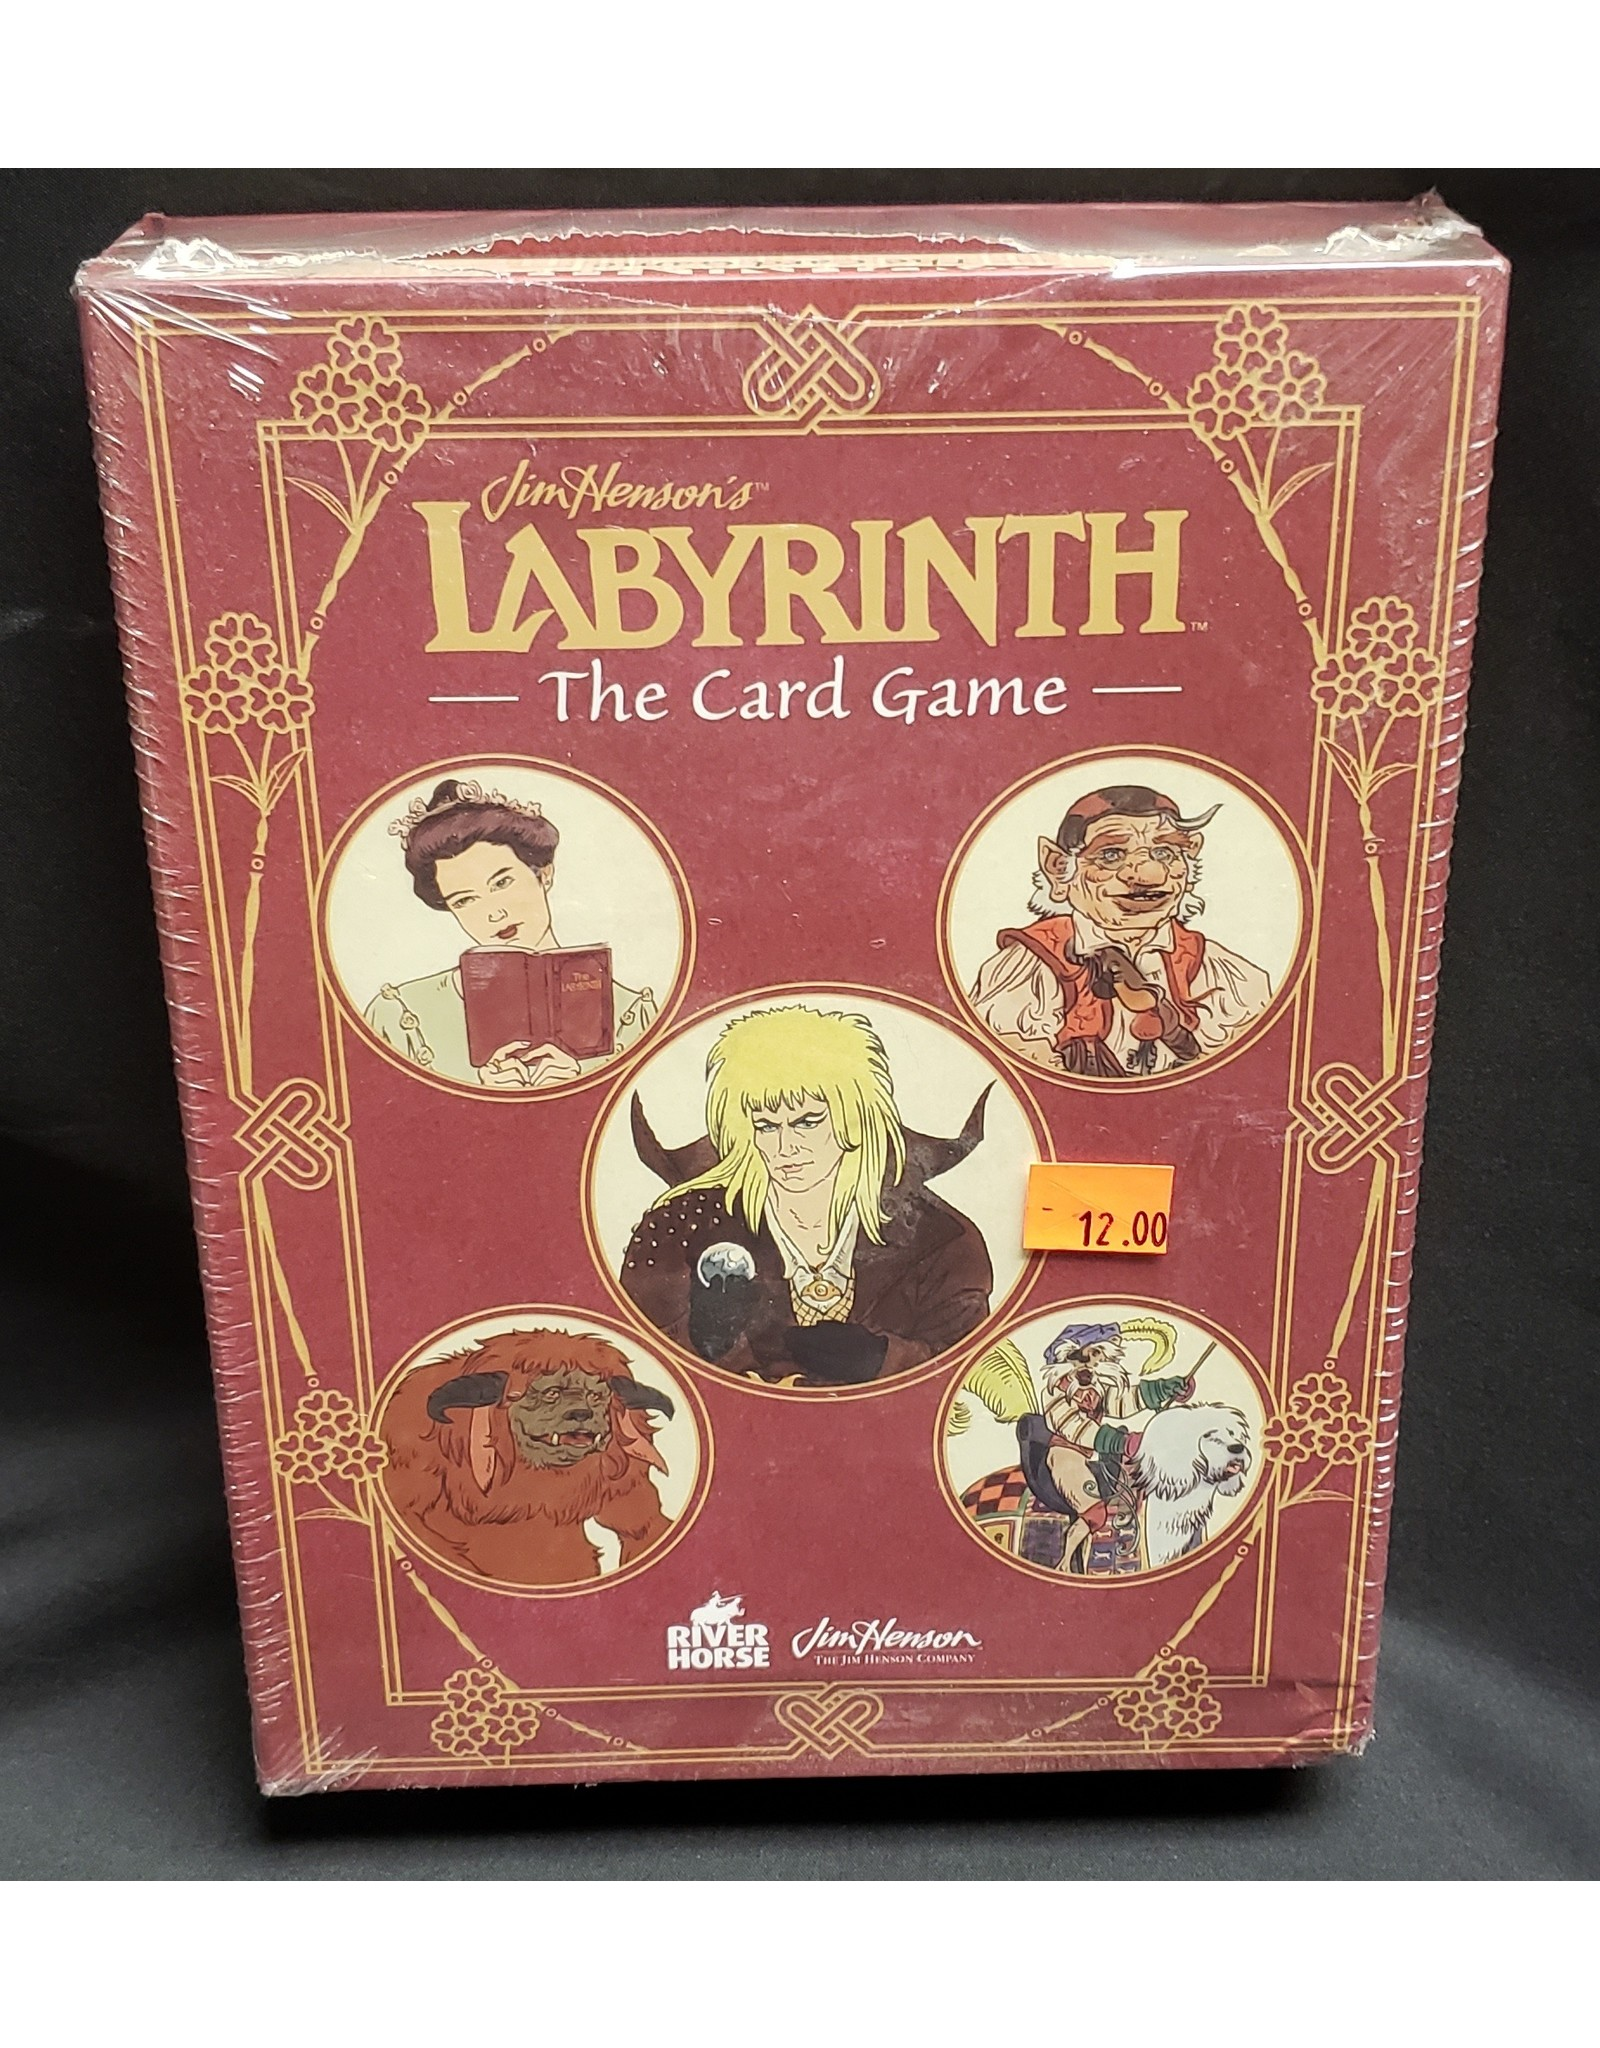 Ding & Dent Labyrinth: The Card Game (Ding & Dent)